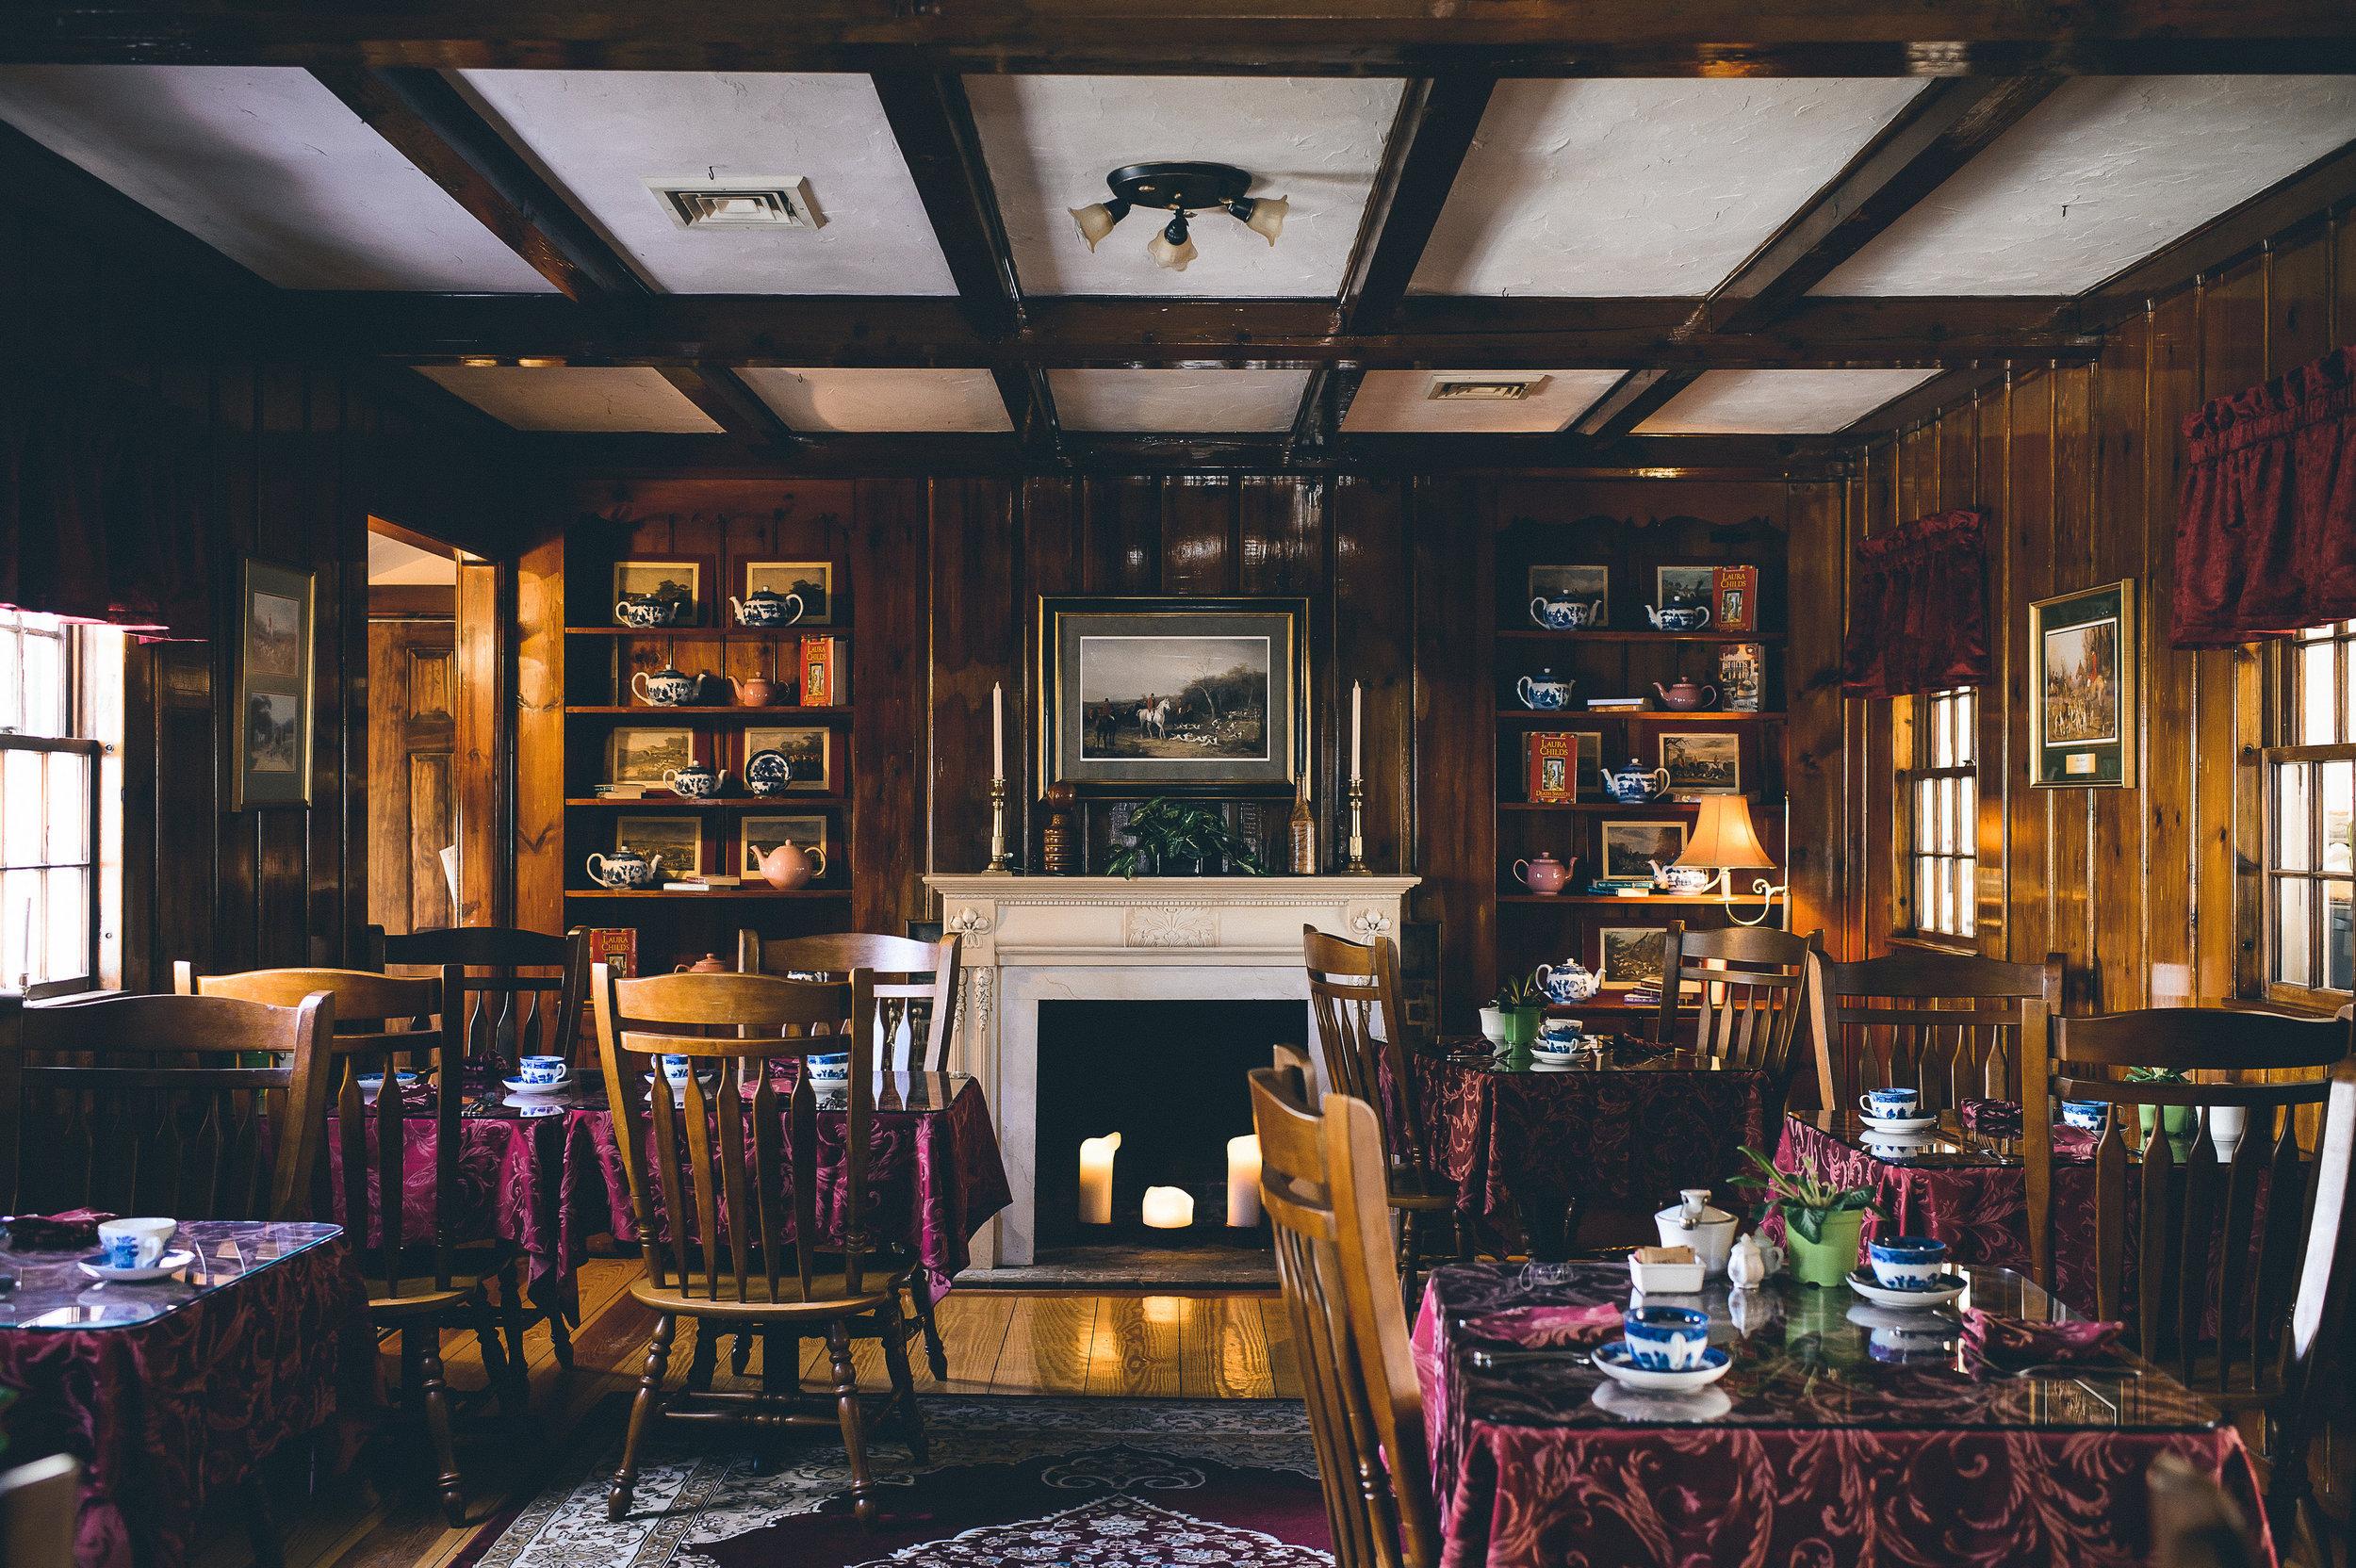 Tell New England Tea - Selects-0002.jpg